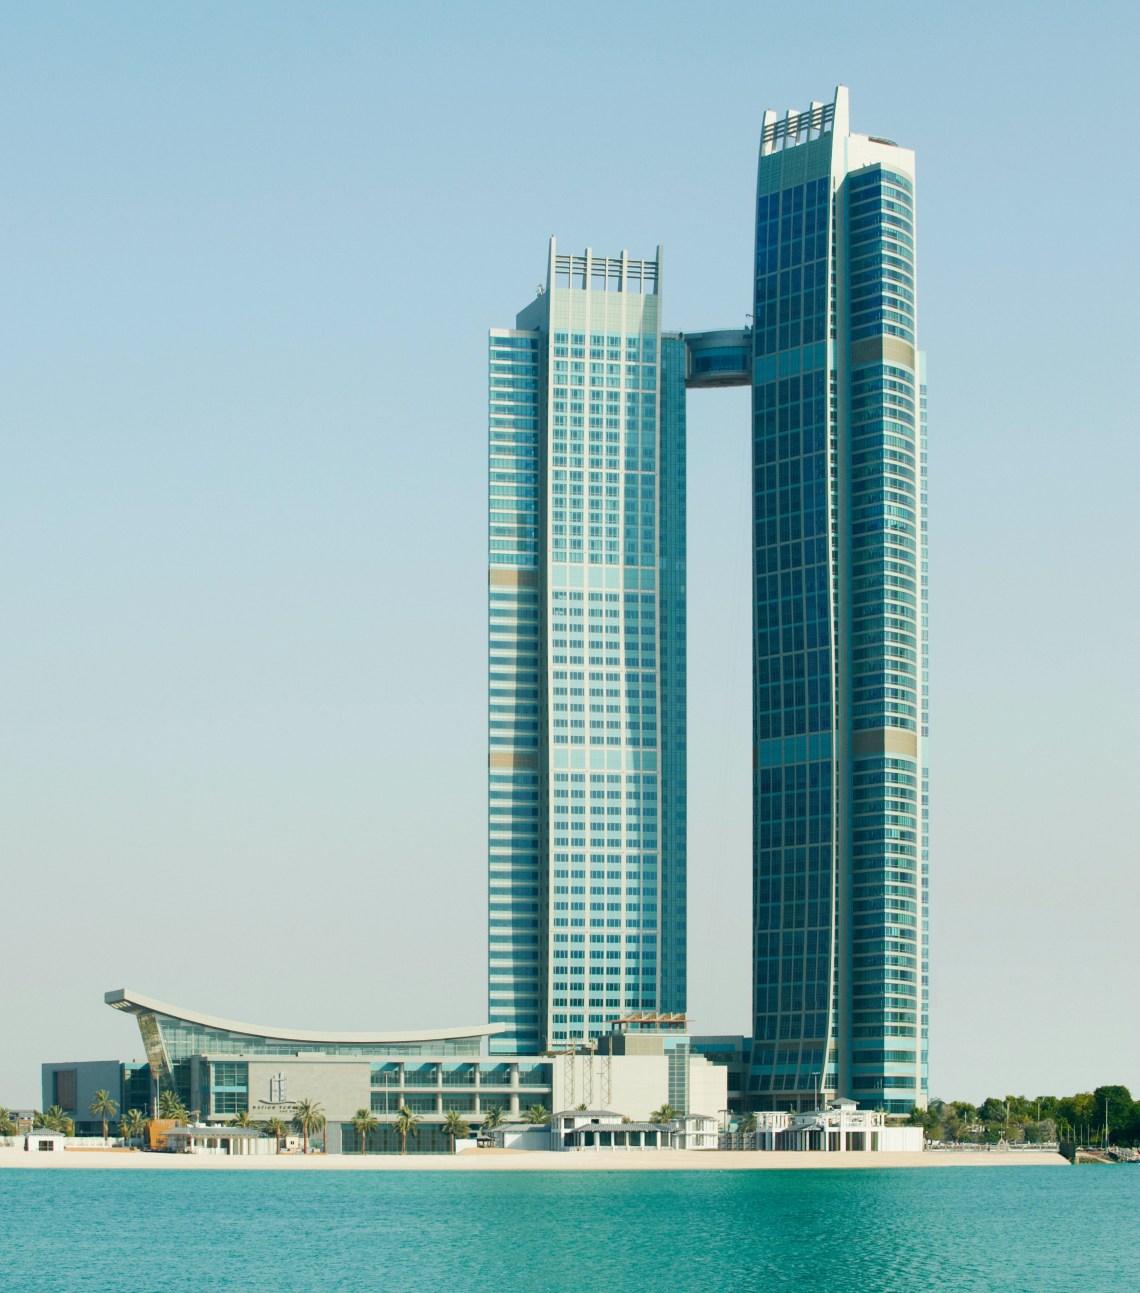 St. Regis Abu Dhabi Sky walk